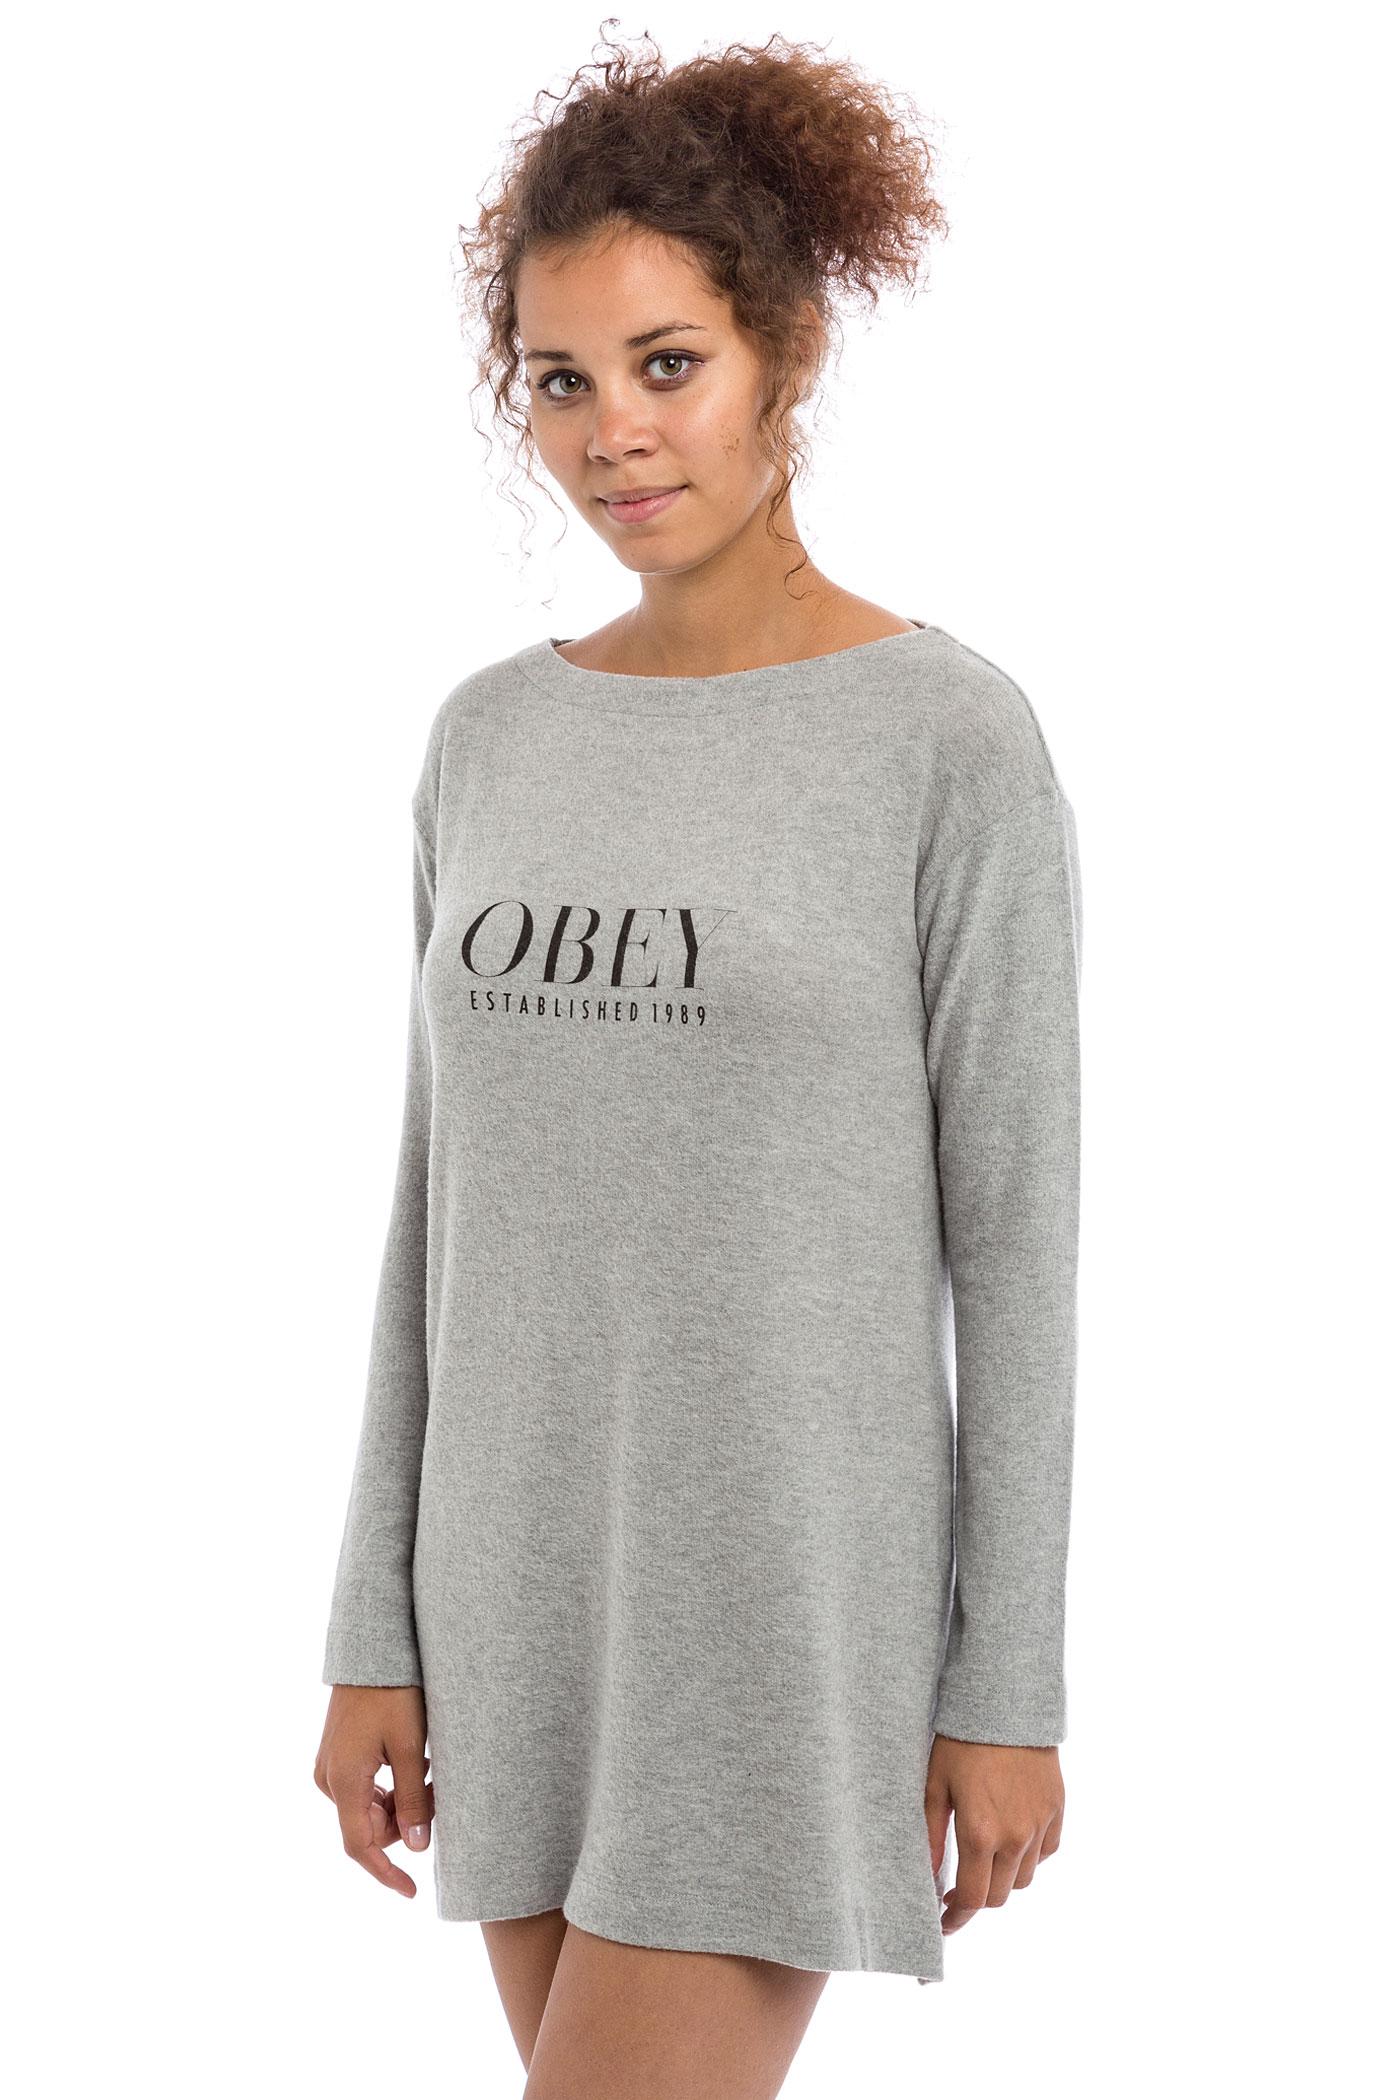 Obey Vanity Dress women (heather grey) buy at skatedeluxe